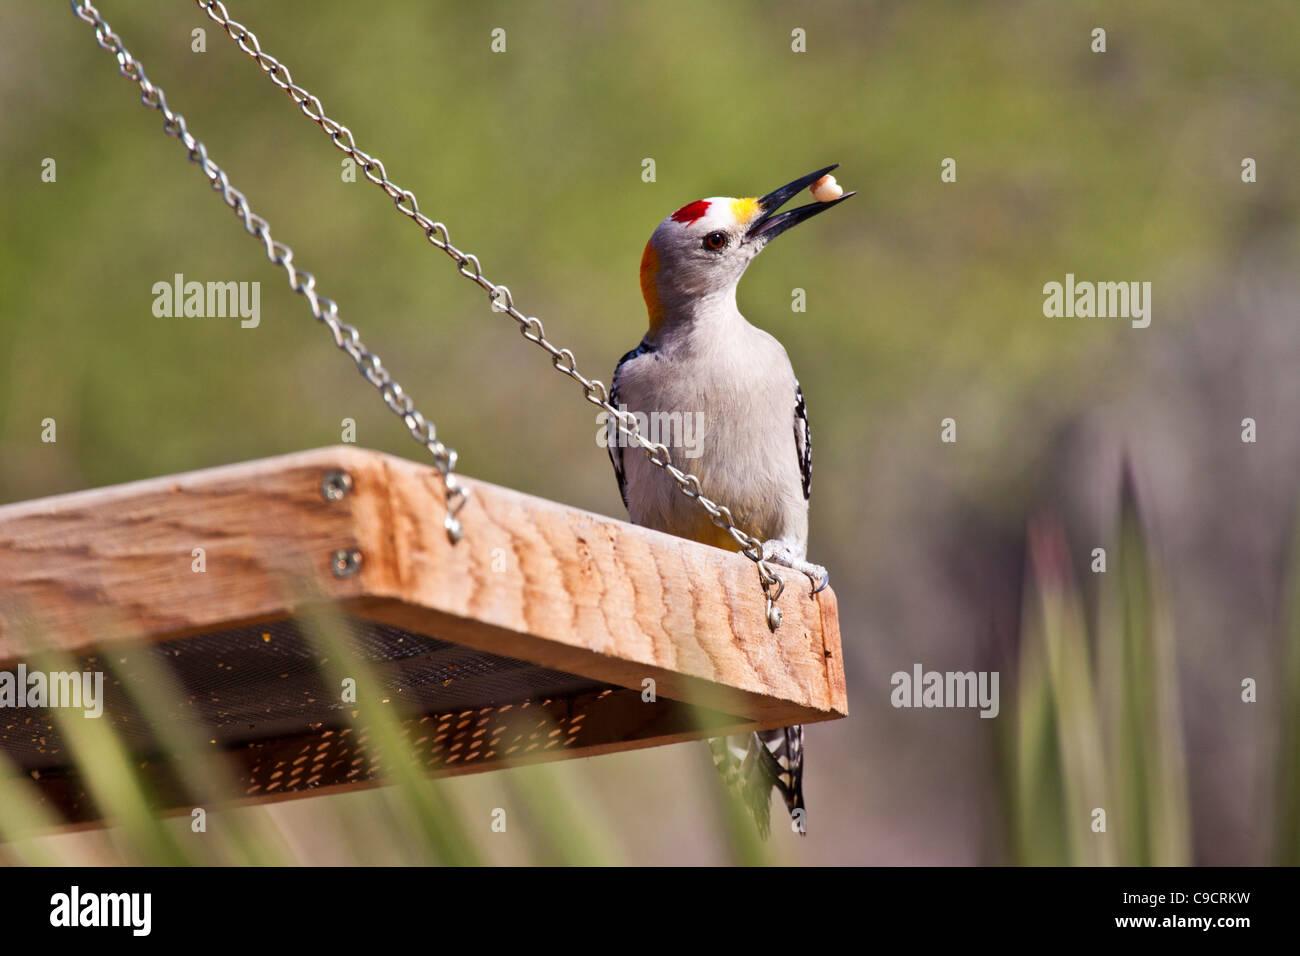 Golden-fronted Woodpecker, Melanerpes aurifrons, at the Javelina-Martin wildlife refuge Stock Photo